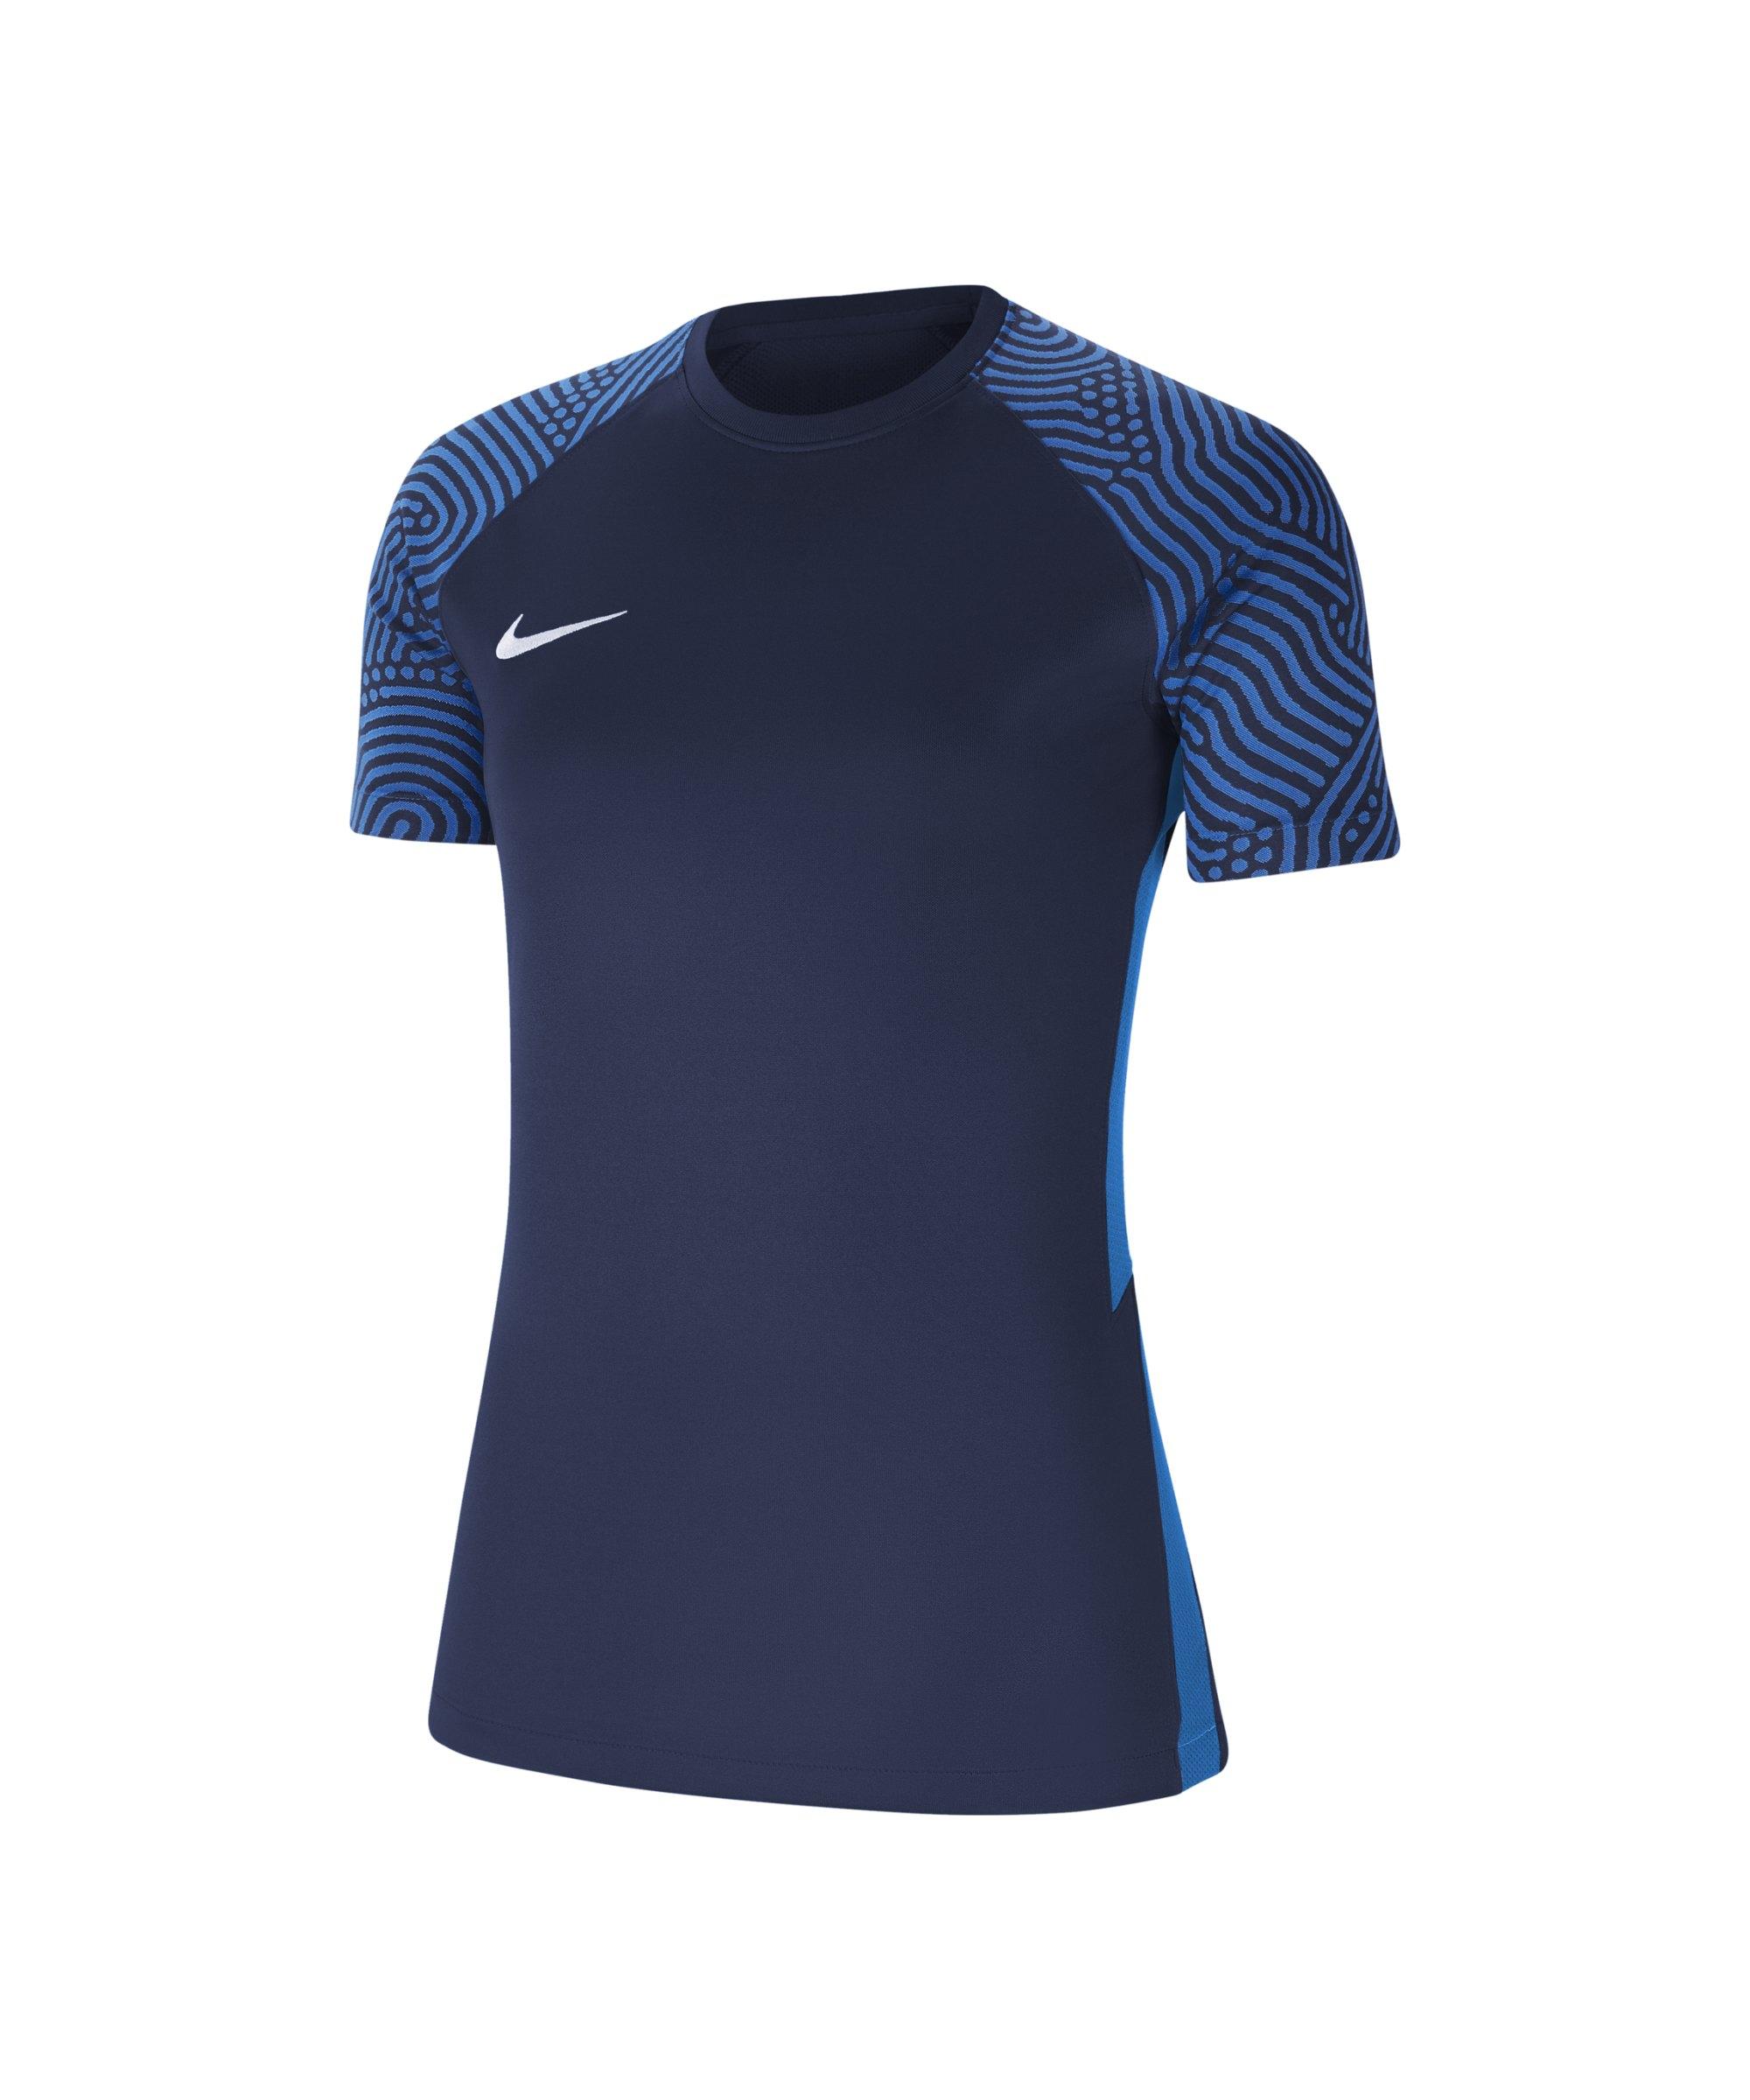 Nike Strike 2 Trikot Damen Blau Weiss F657 - blau